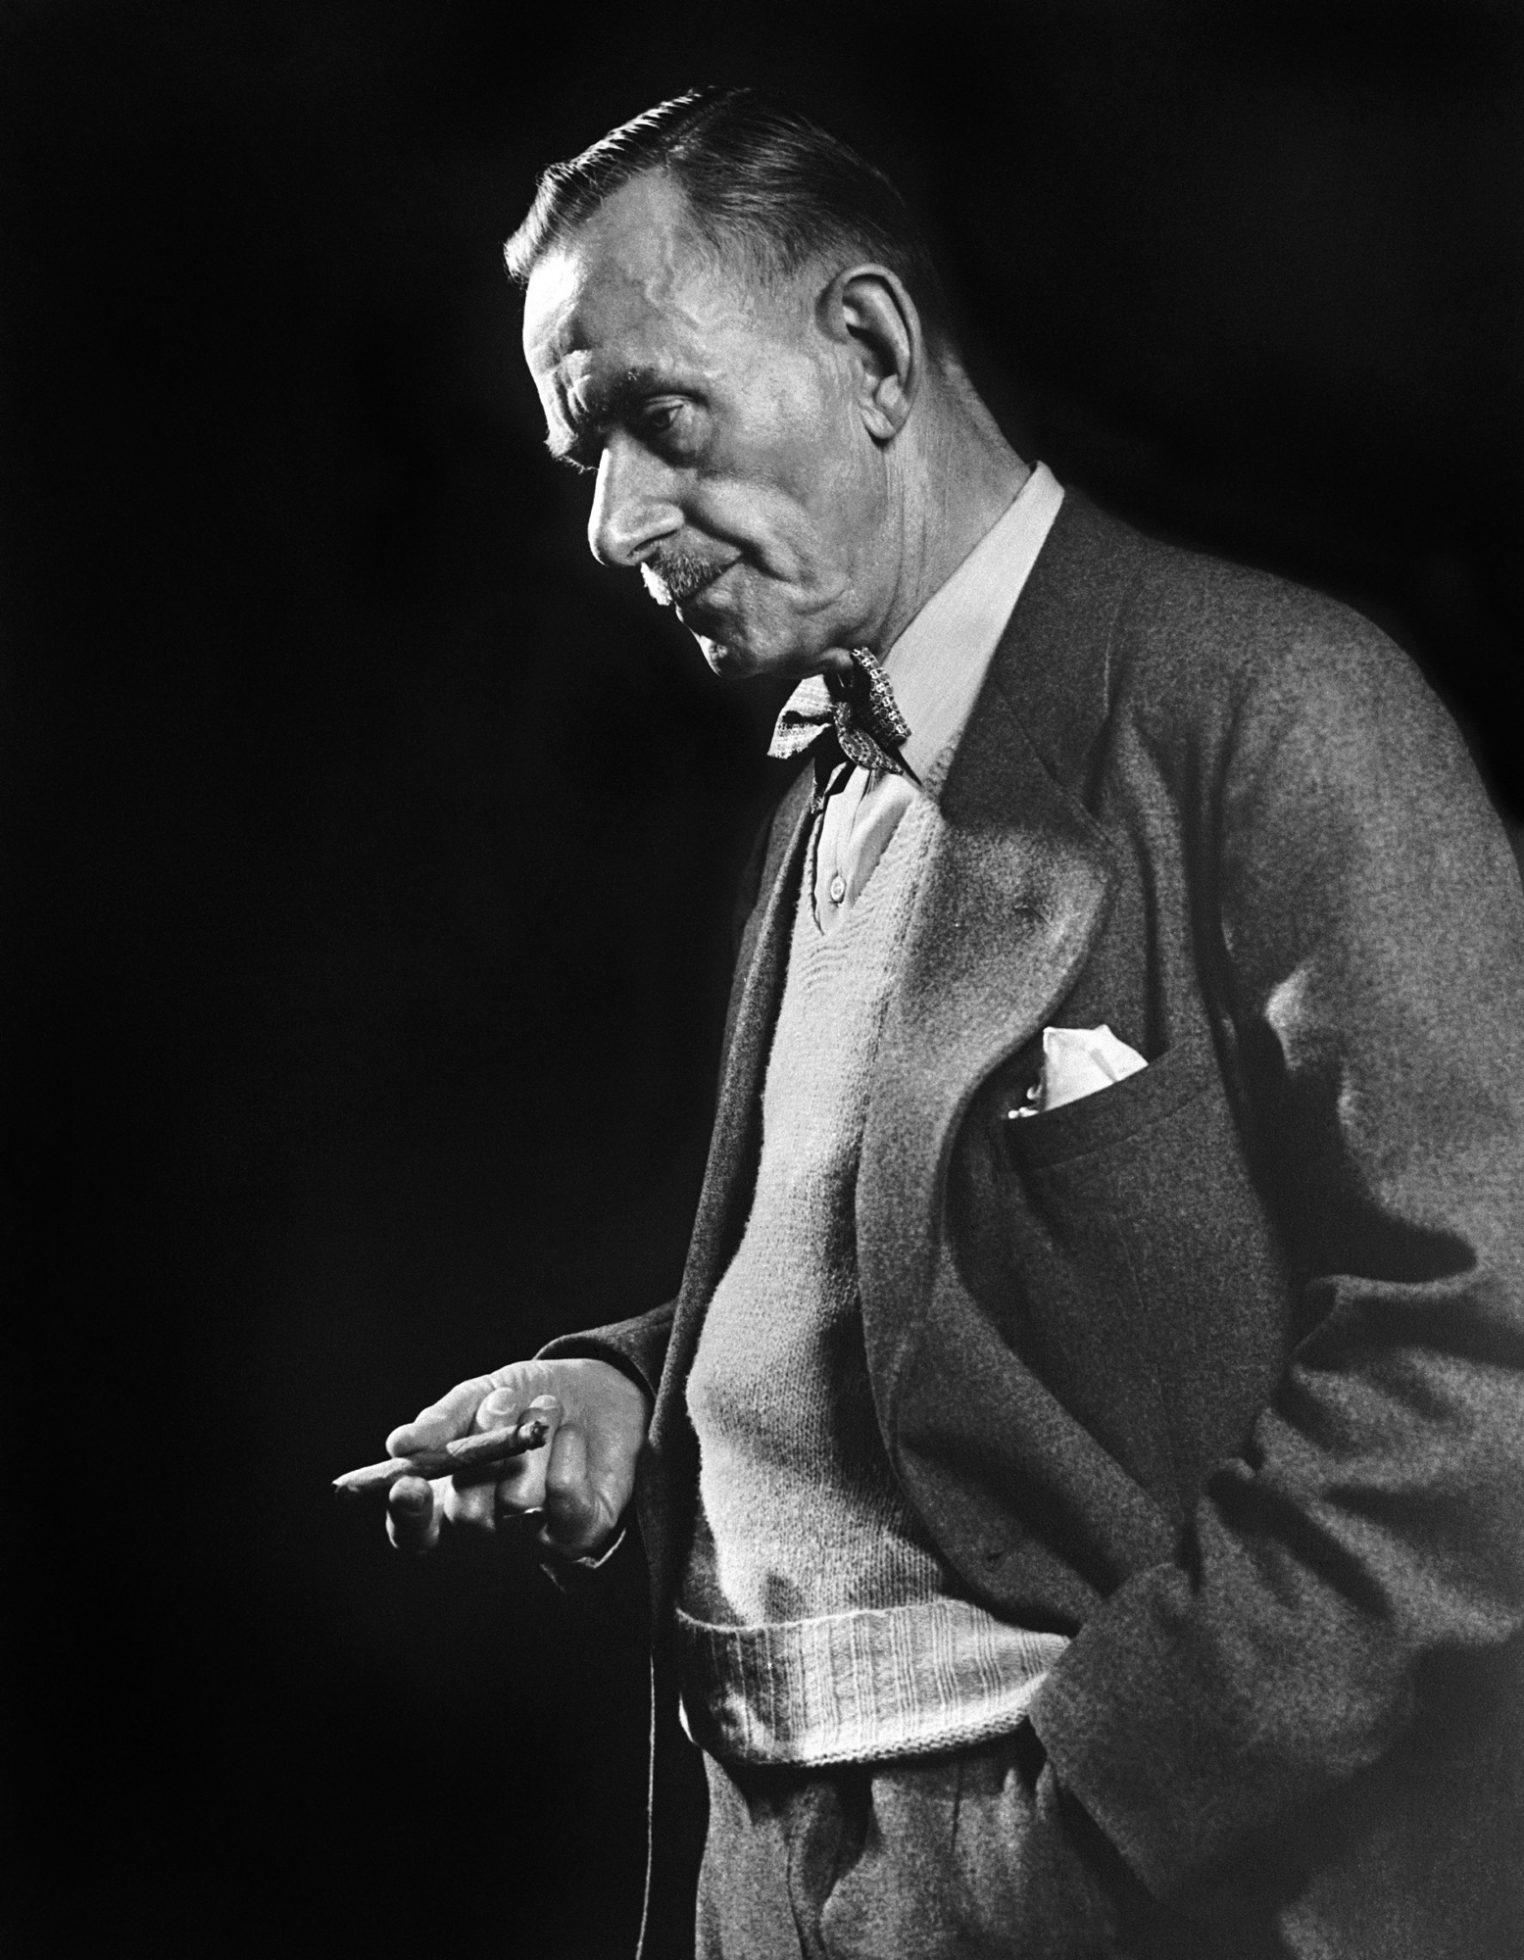 Fotó: Yousuf Karsh: Thomas Mann, 1946 © Yousuf Karsh